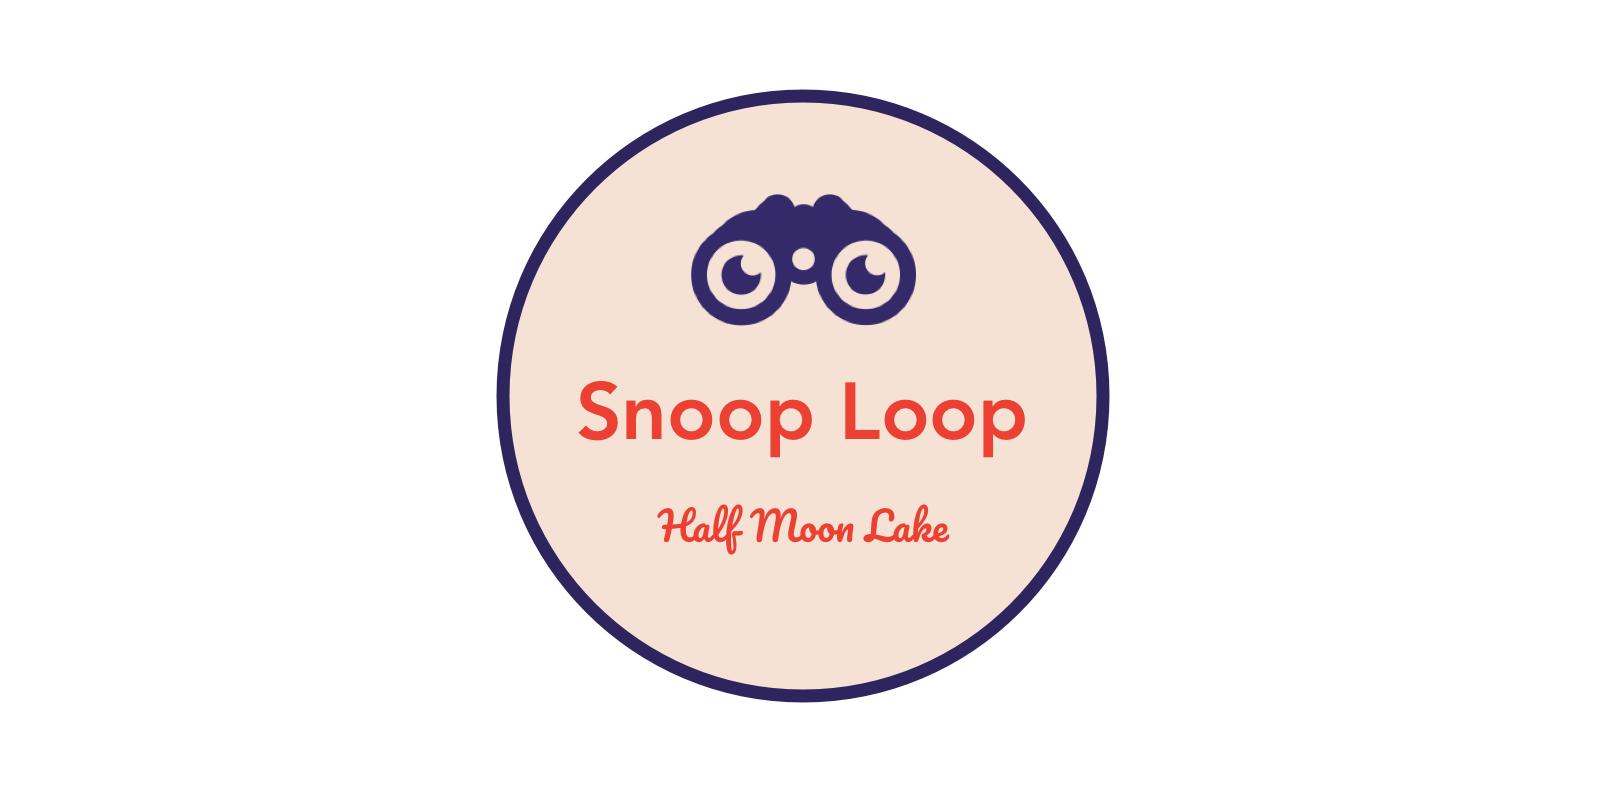 Snoop Loop Logo with white background.png